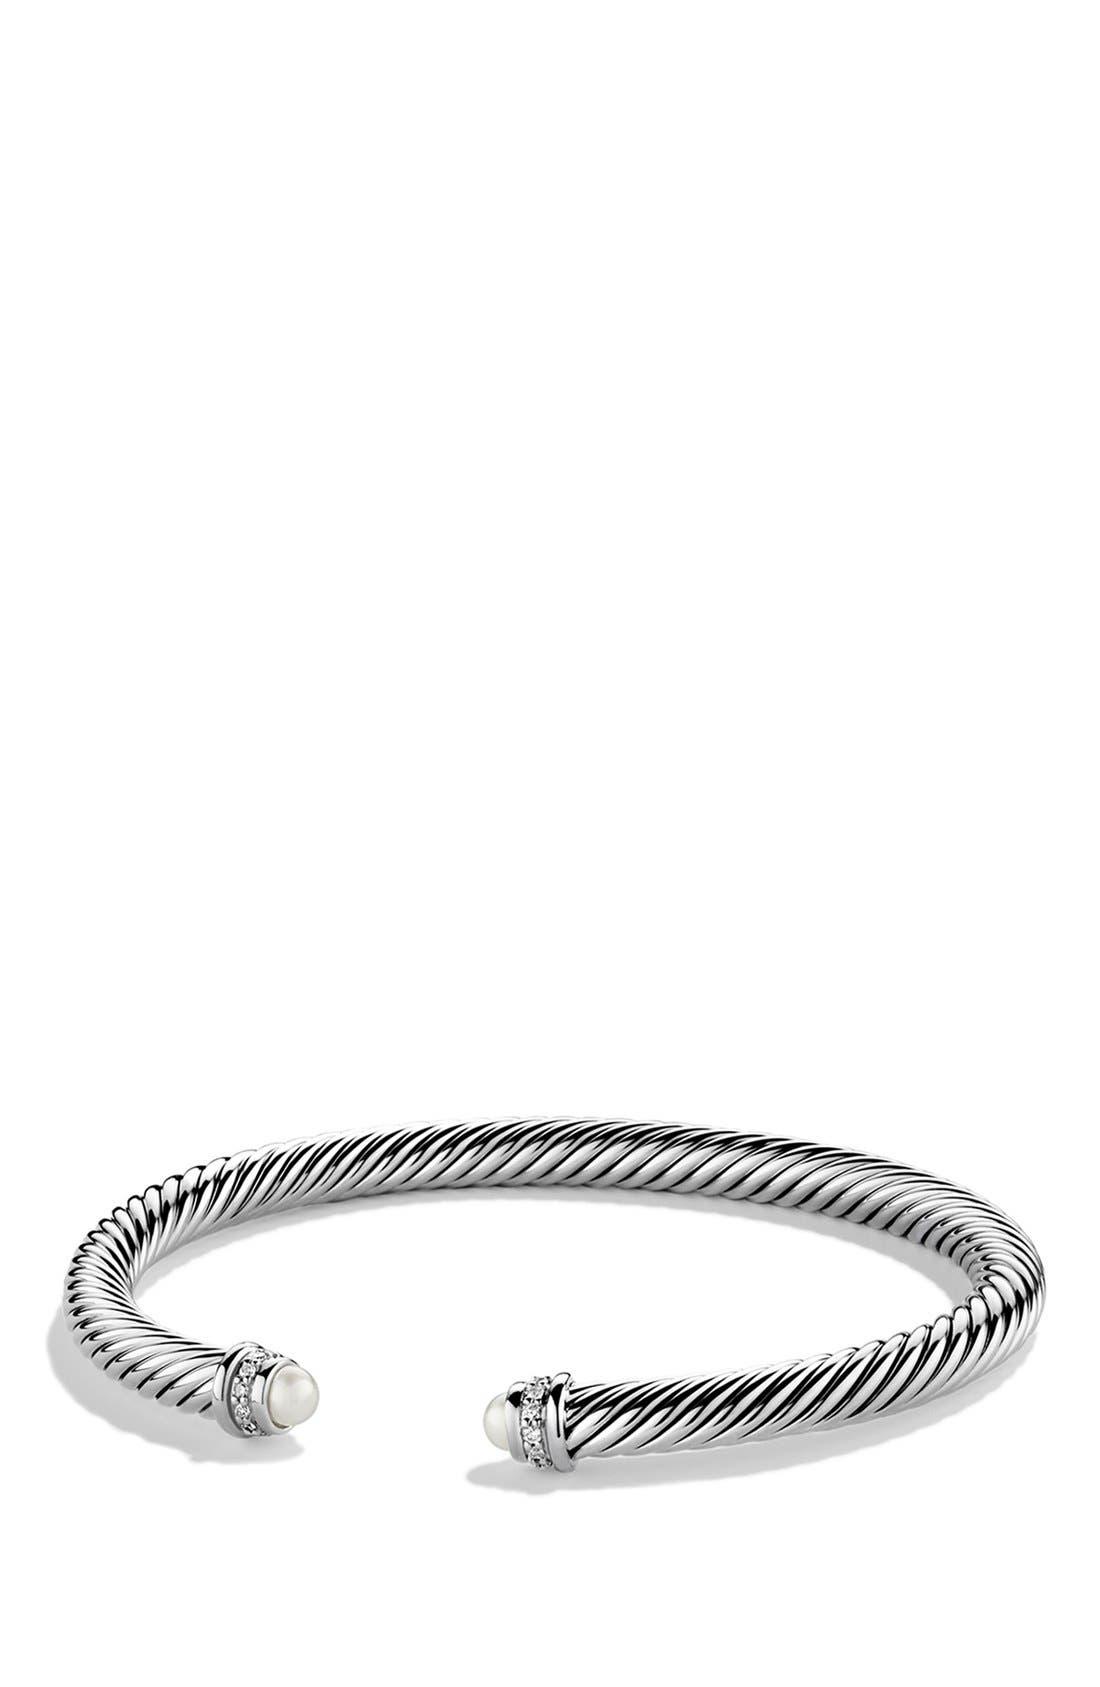 Cable Classics Bracelet with Semiprecious Stones & Diamonds, 5mm, Main, color, PEARL